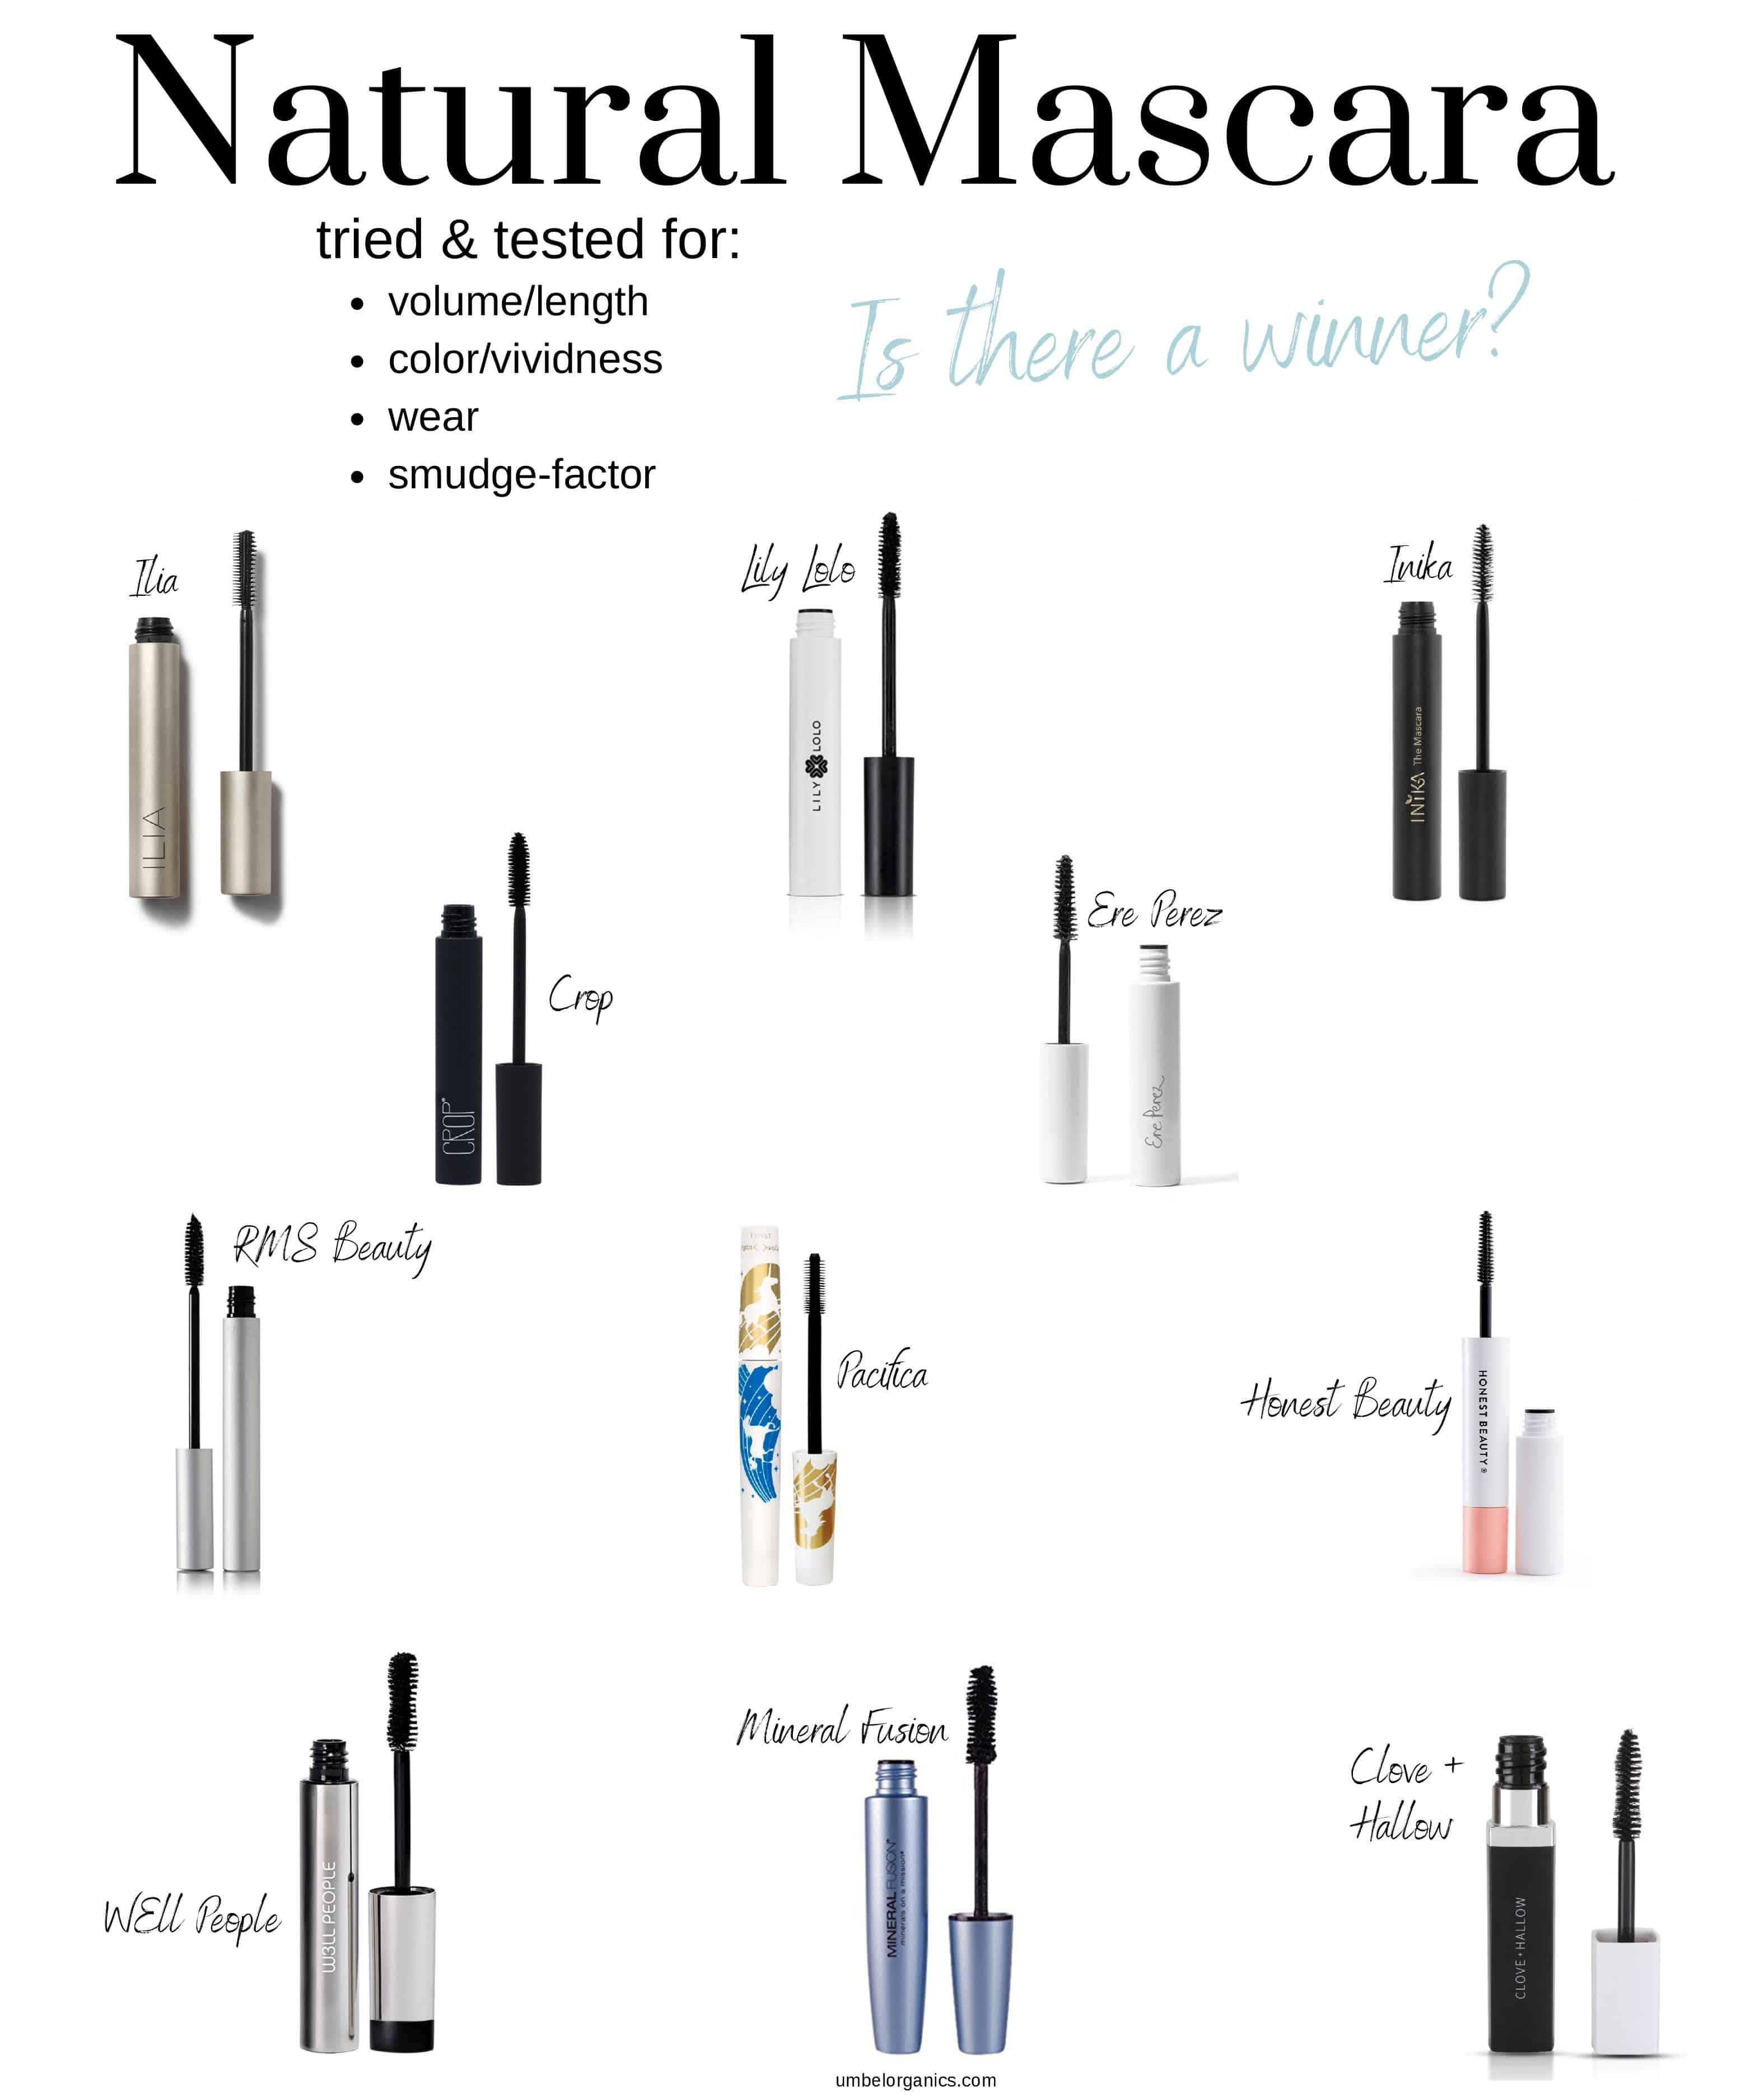 11 natural mascara brands tested